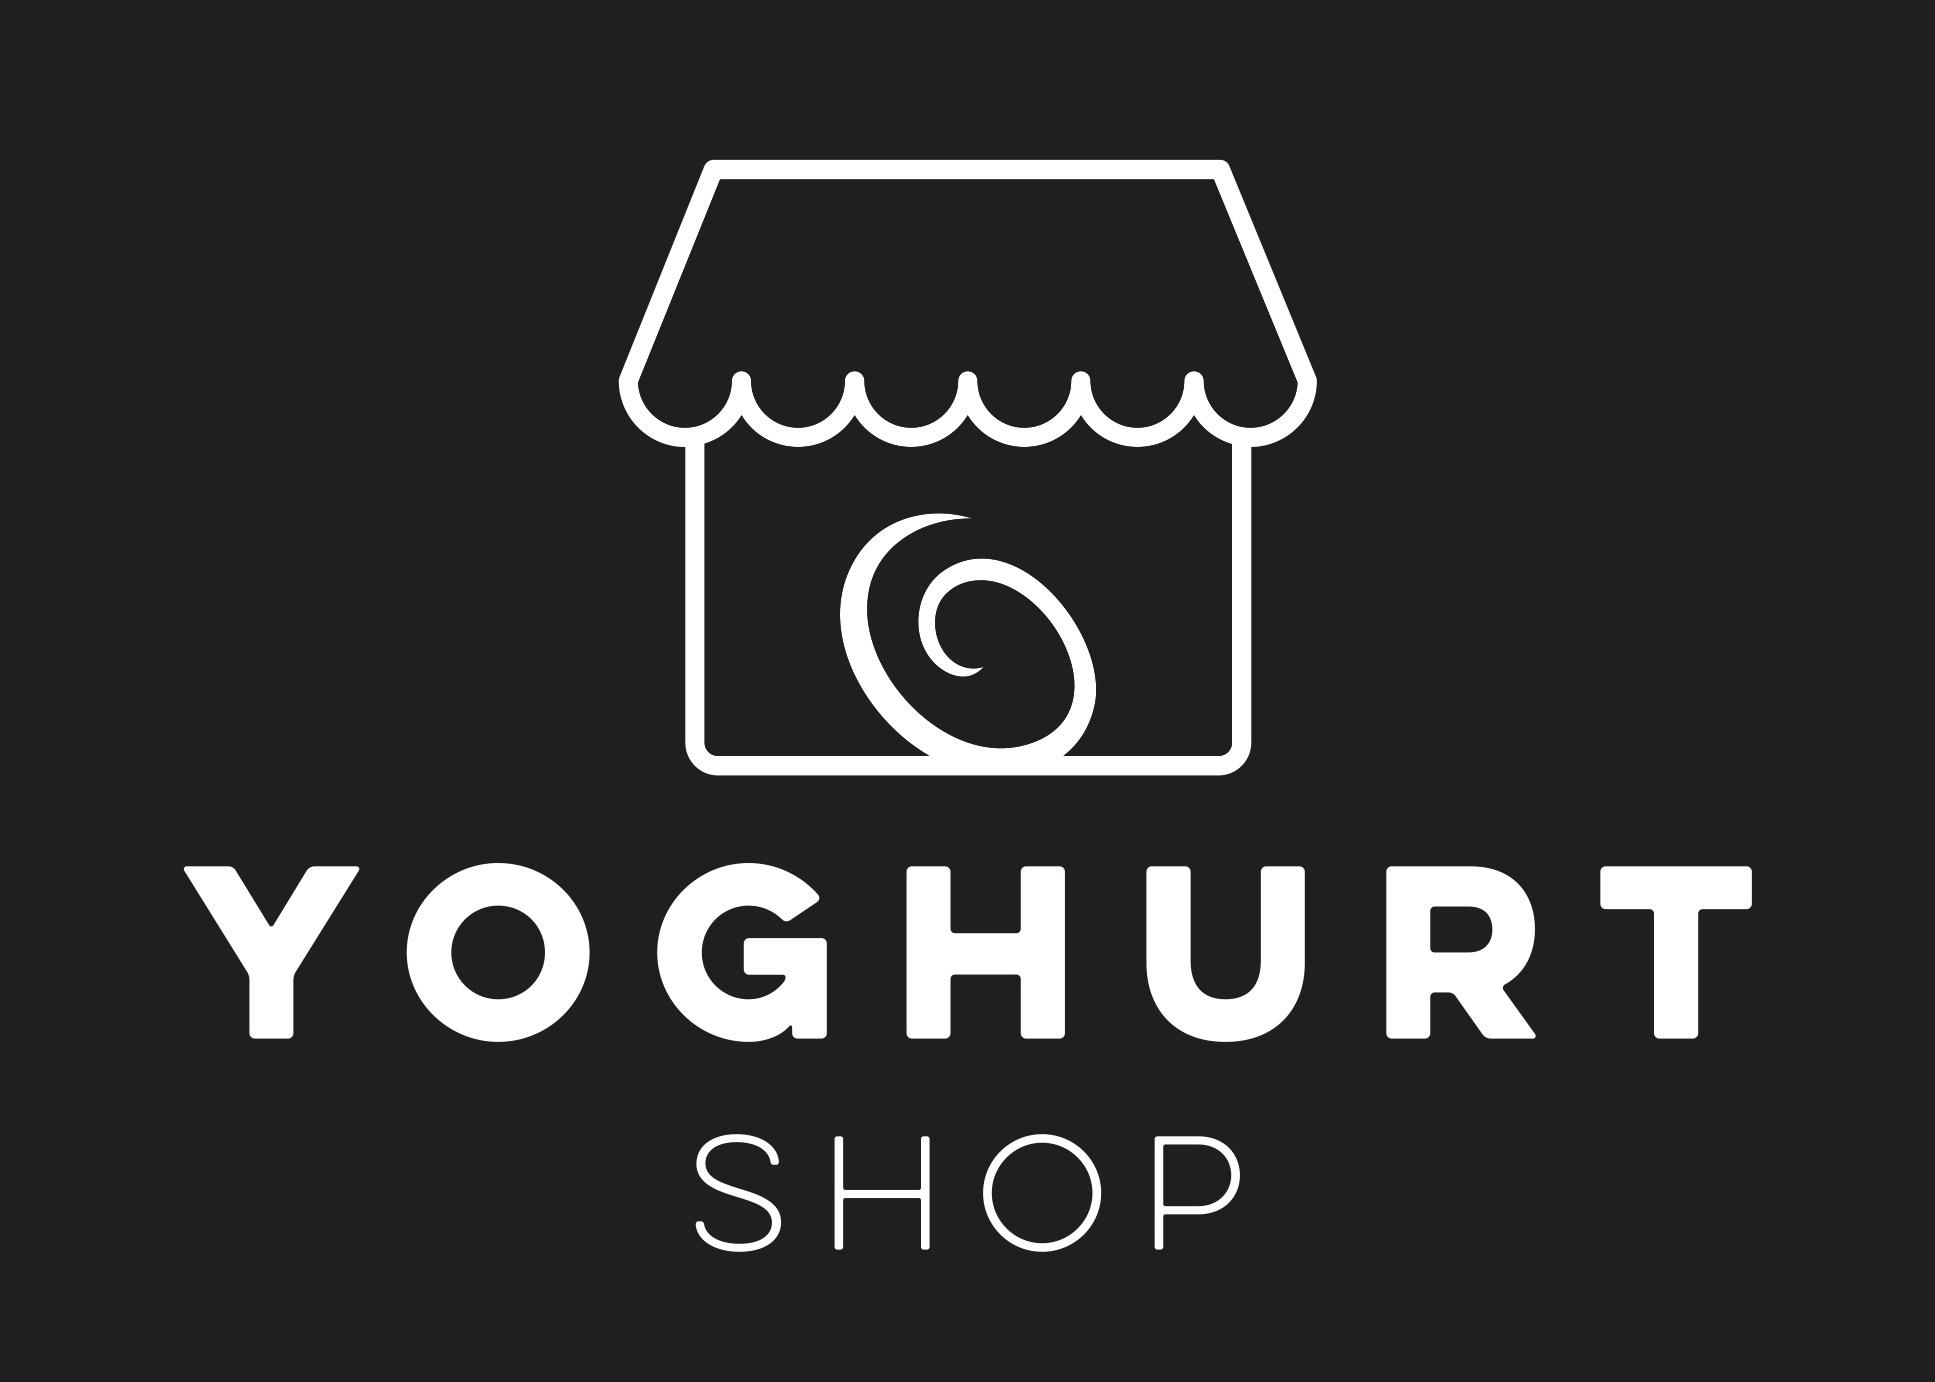 The Yoghurt Shop.jpg